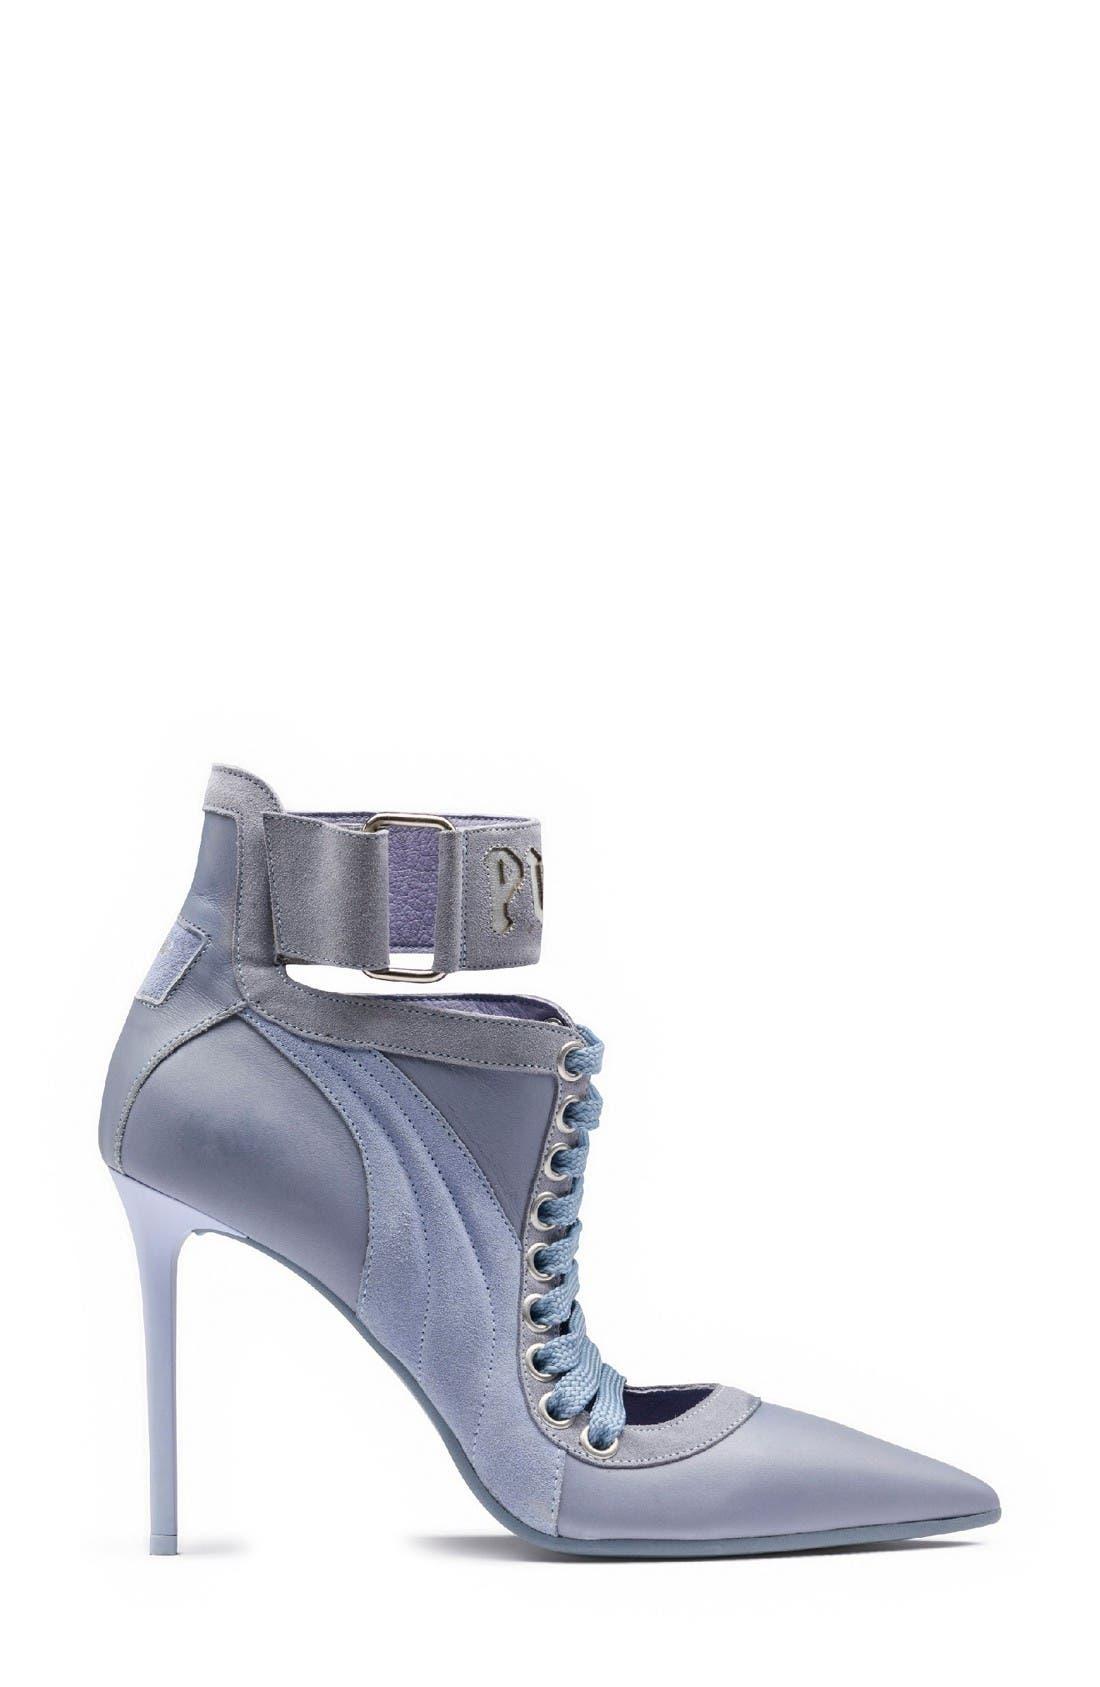 PUMA FENTY PUMA by Rihanna Lace-Up Sneaker Pump